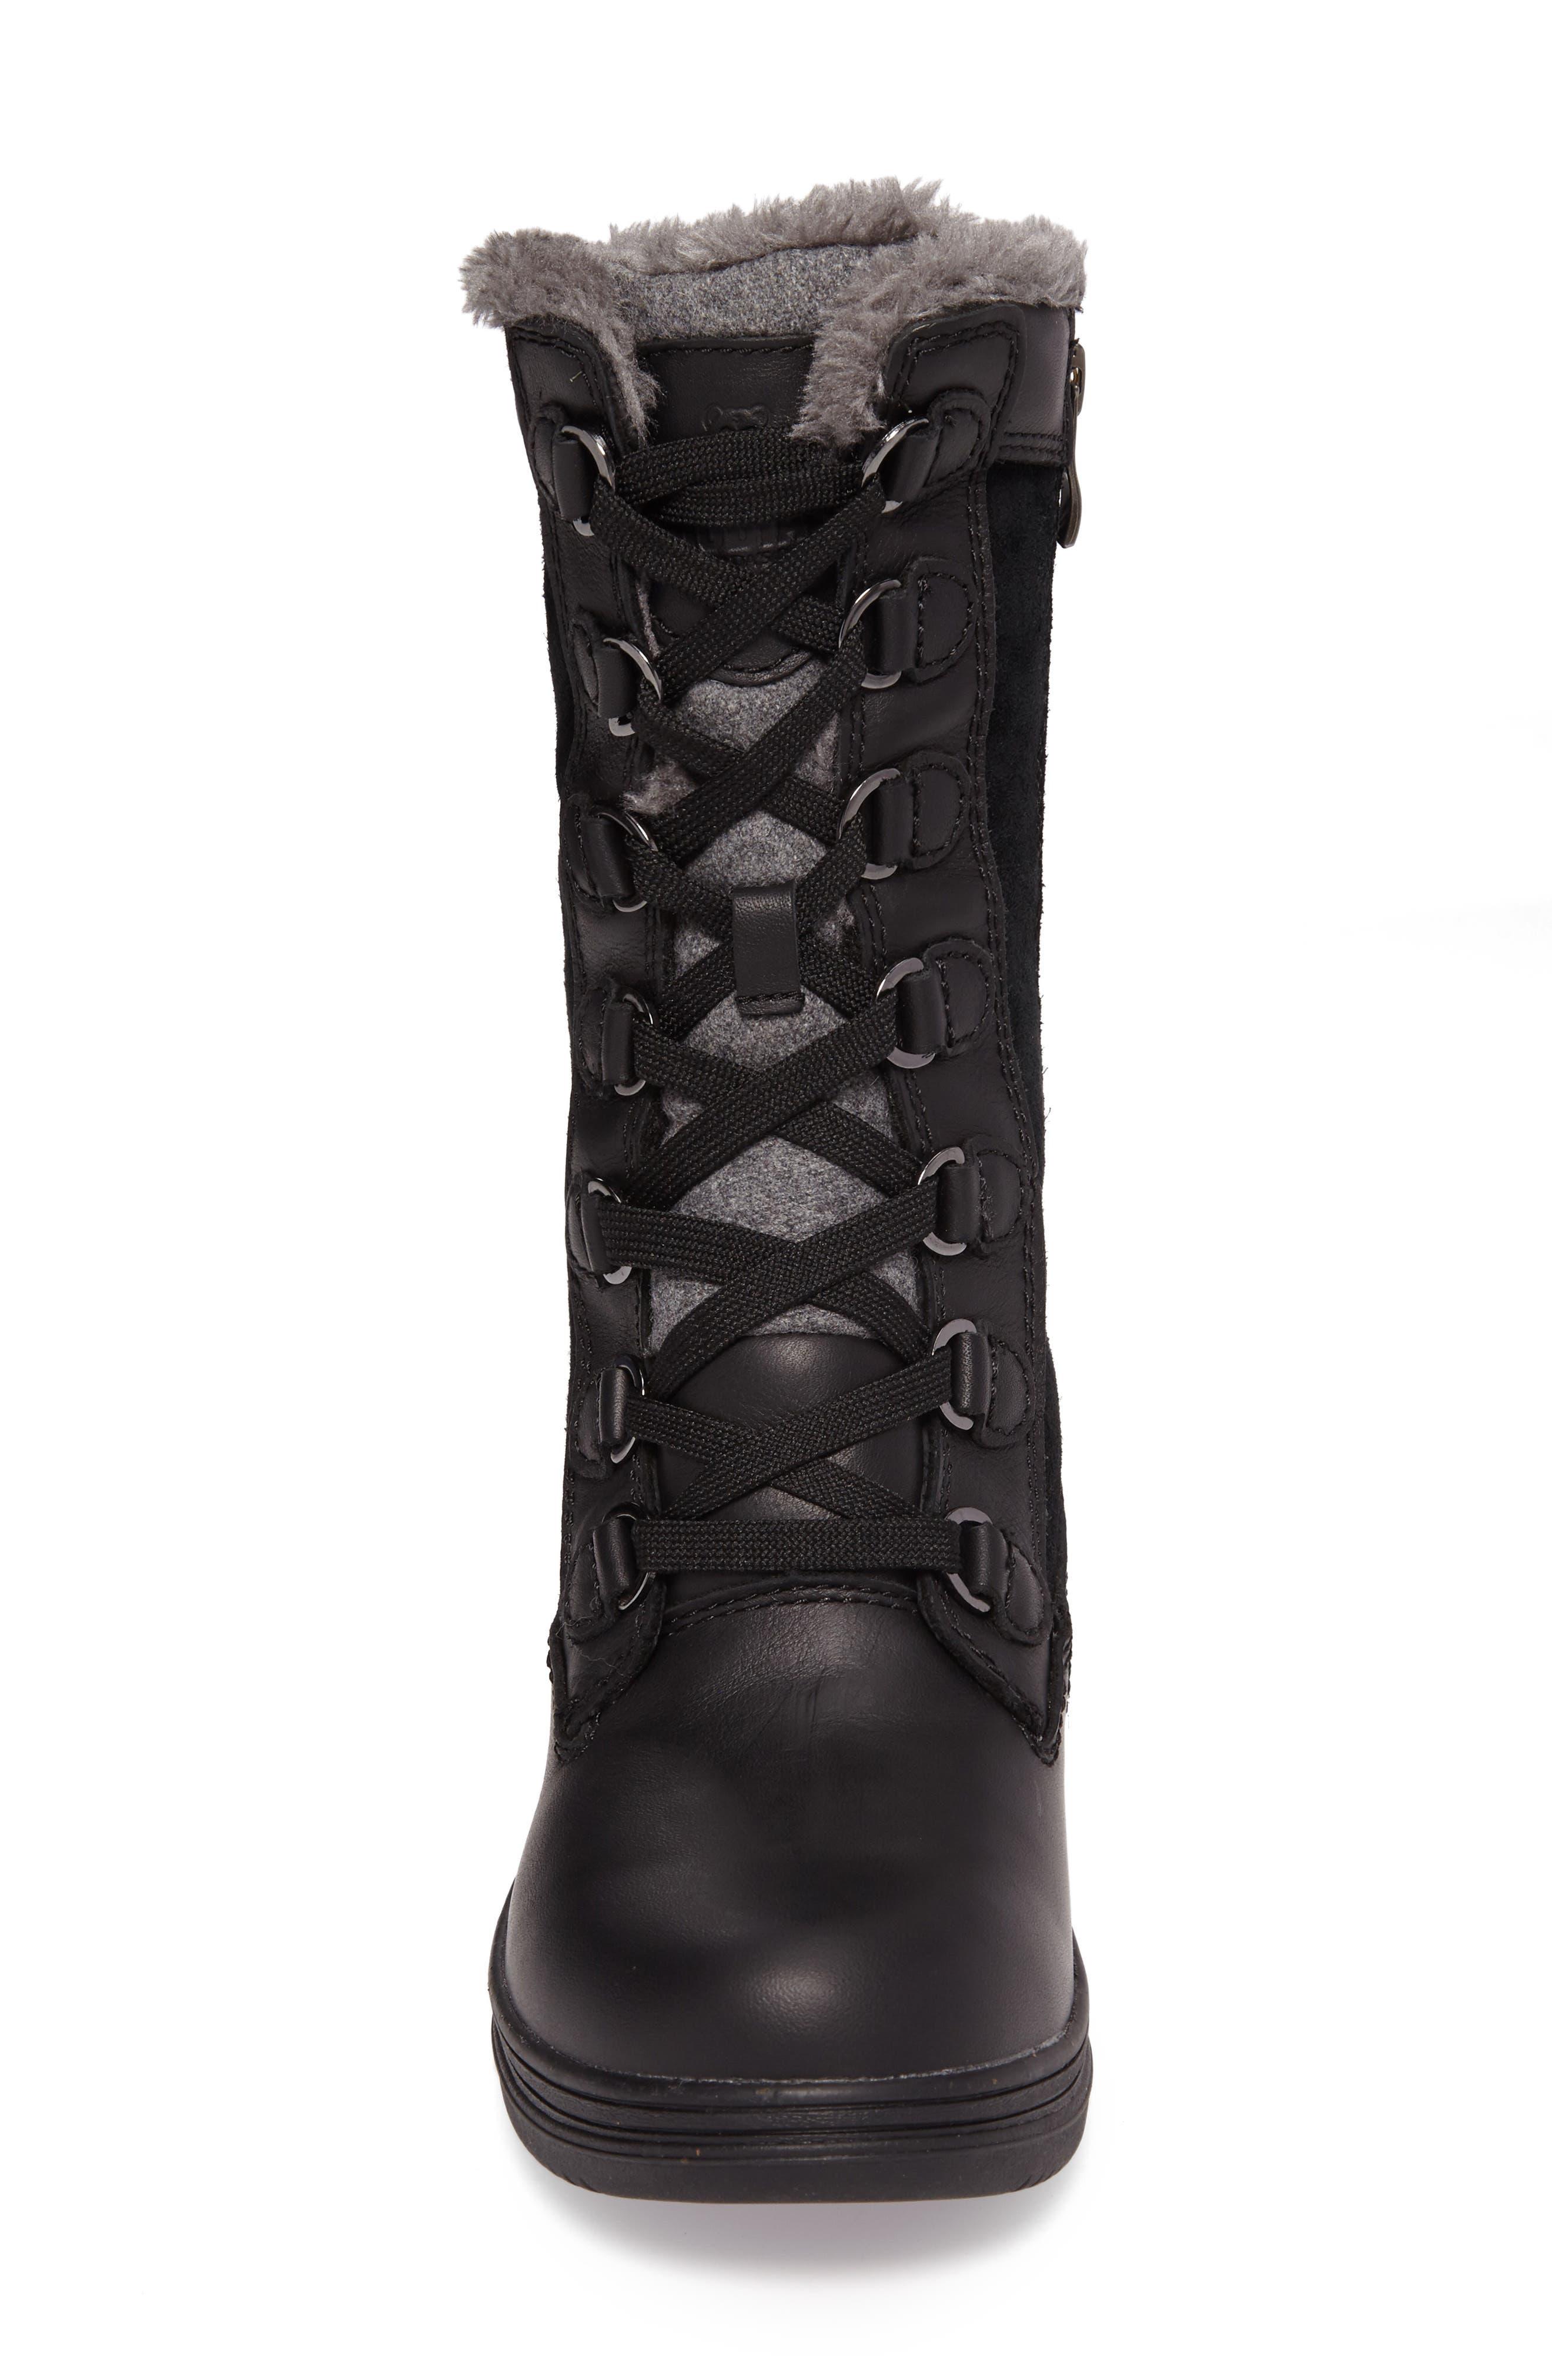 Glata Waterproof Boot,                             Alternate thumbnail 4, color,                             Black Leather